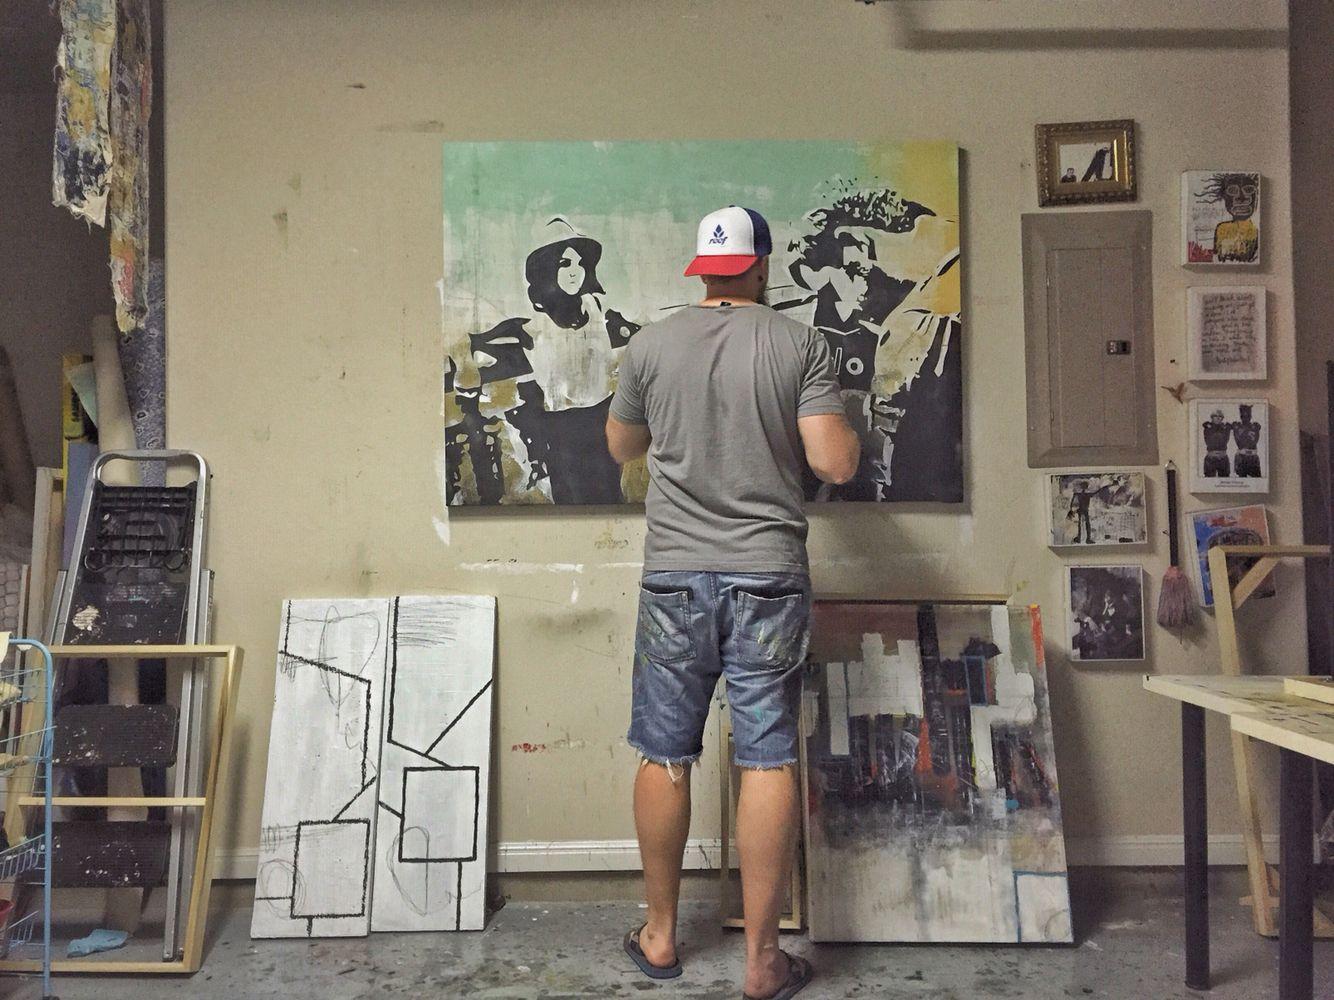 Finishing Up A Commission Piece Art Artstudio